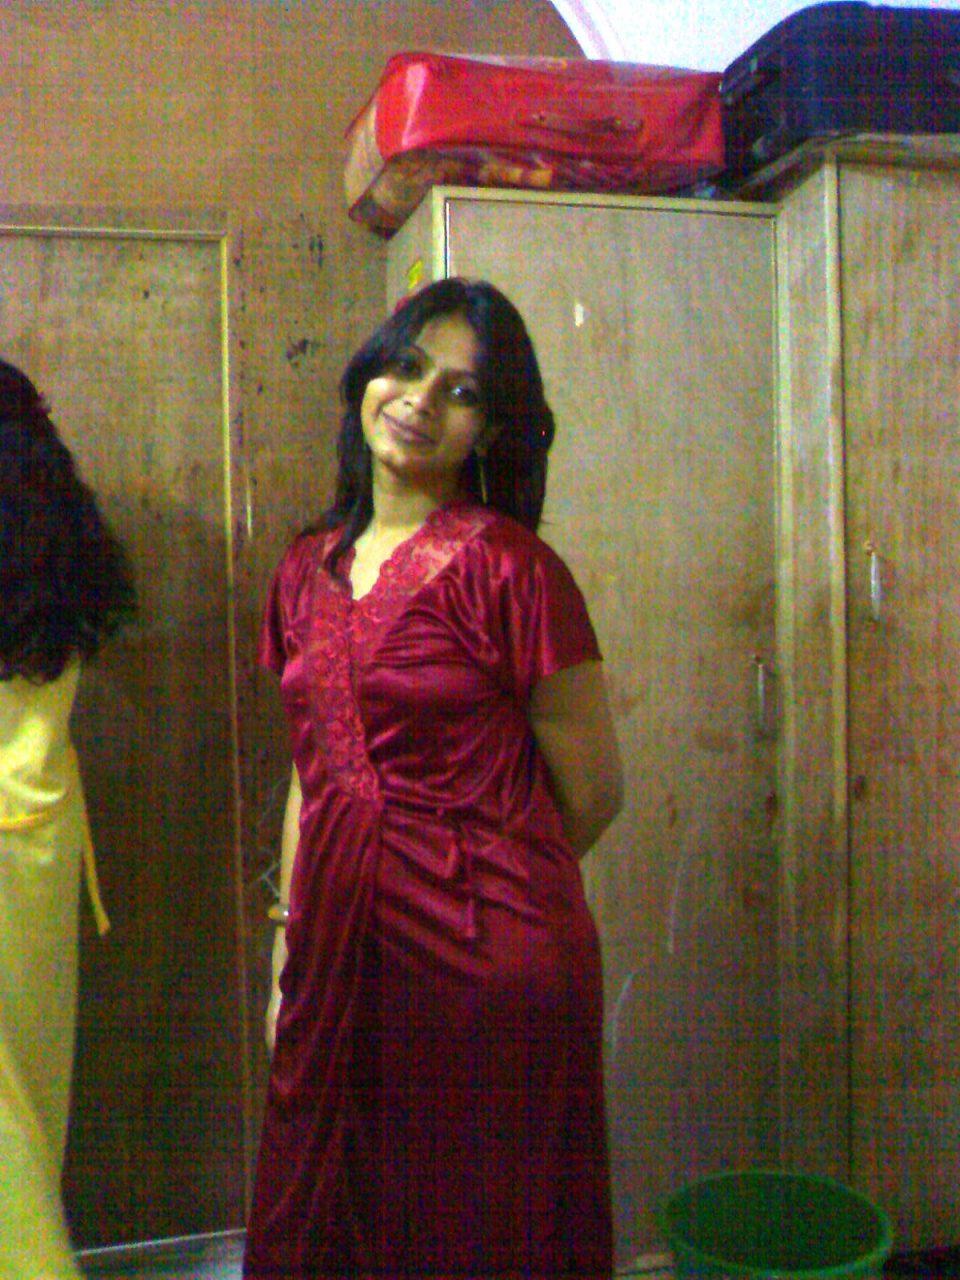 Kerela Nude Bhabhi Showing Her Boobs - Maxi Me Bhabhi Ki Pics-3852